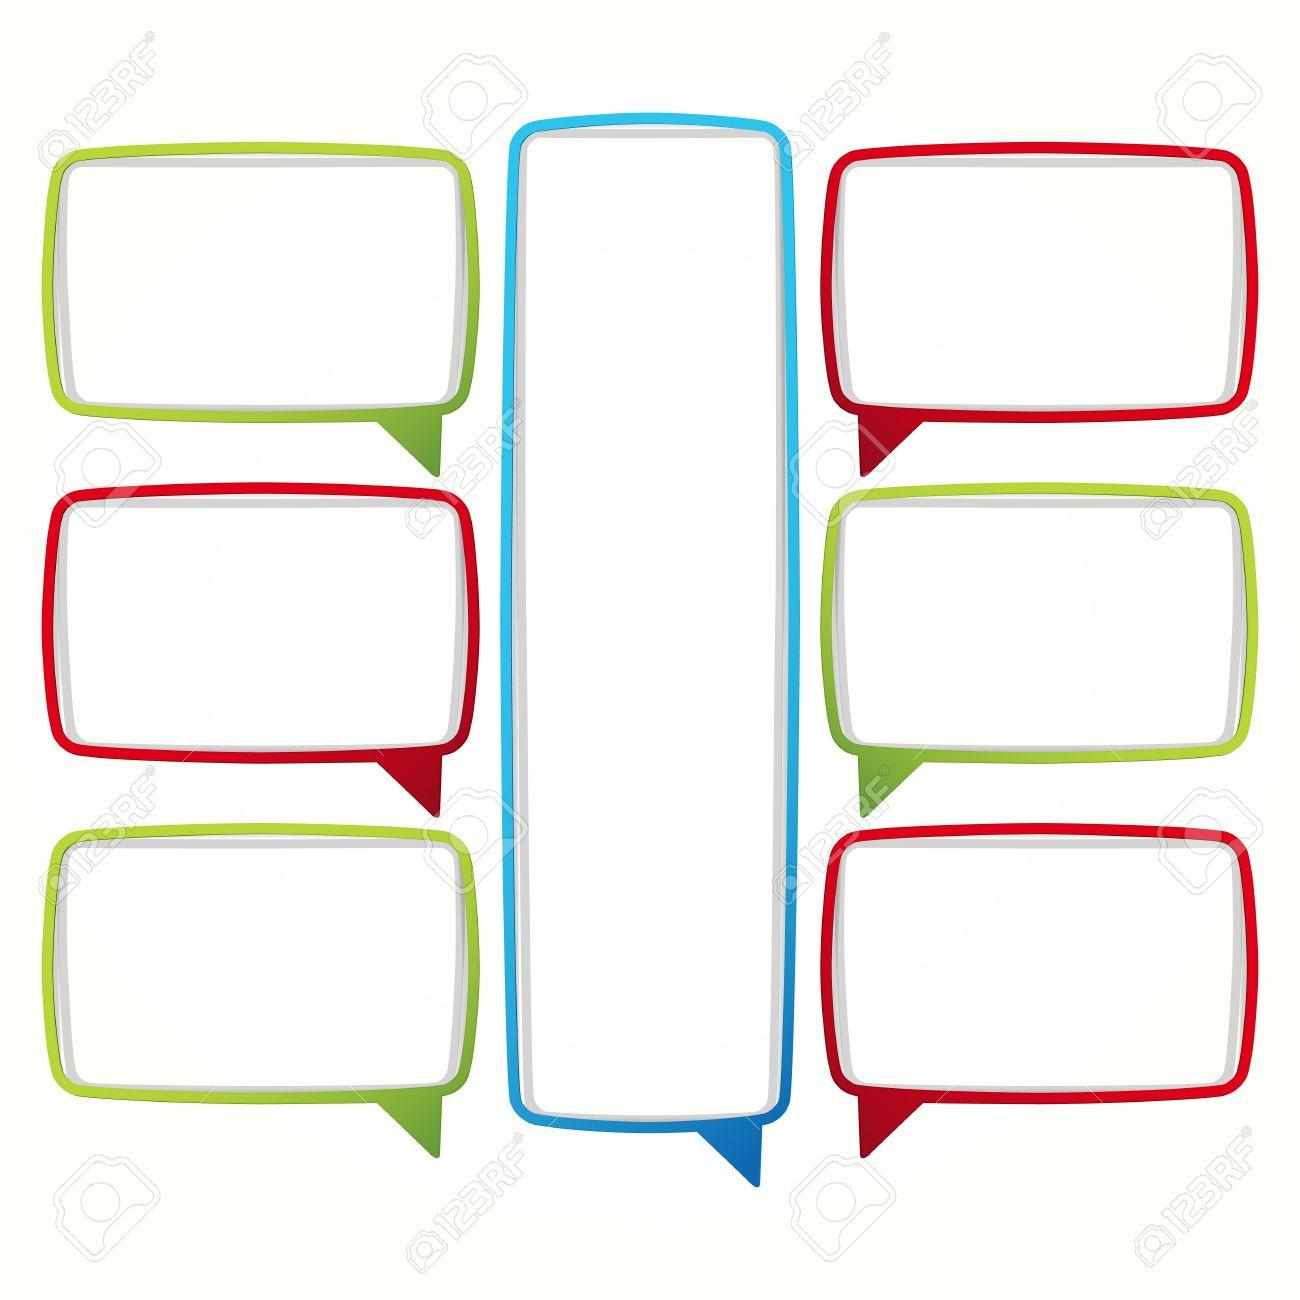 Blank Text Message Bubble Colorful speech bubble frames